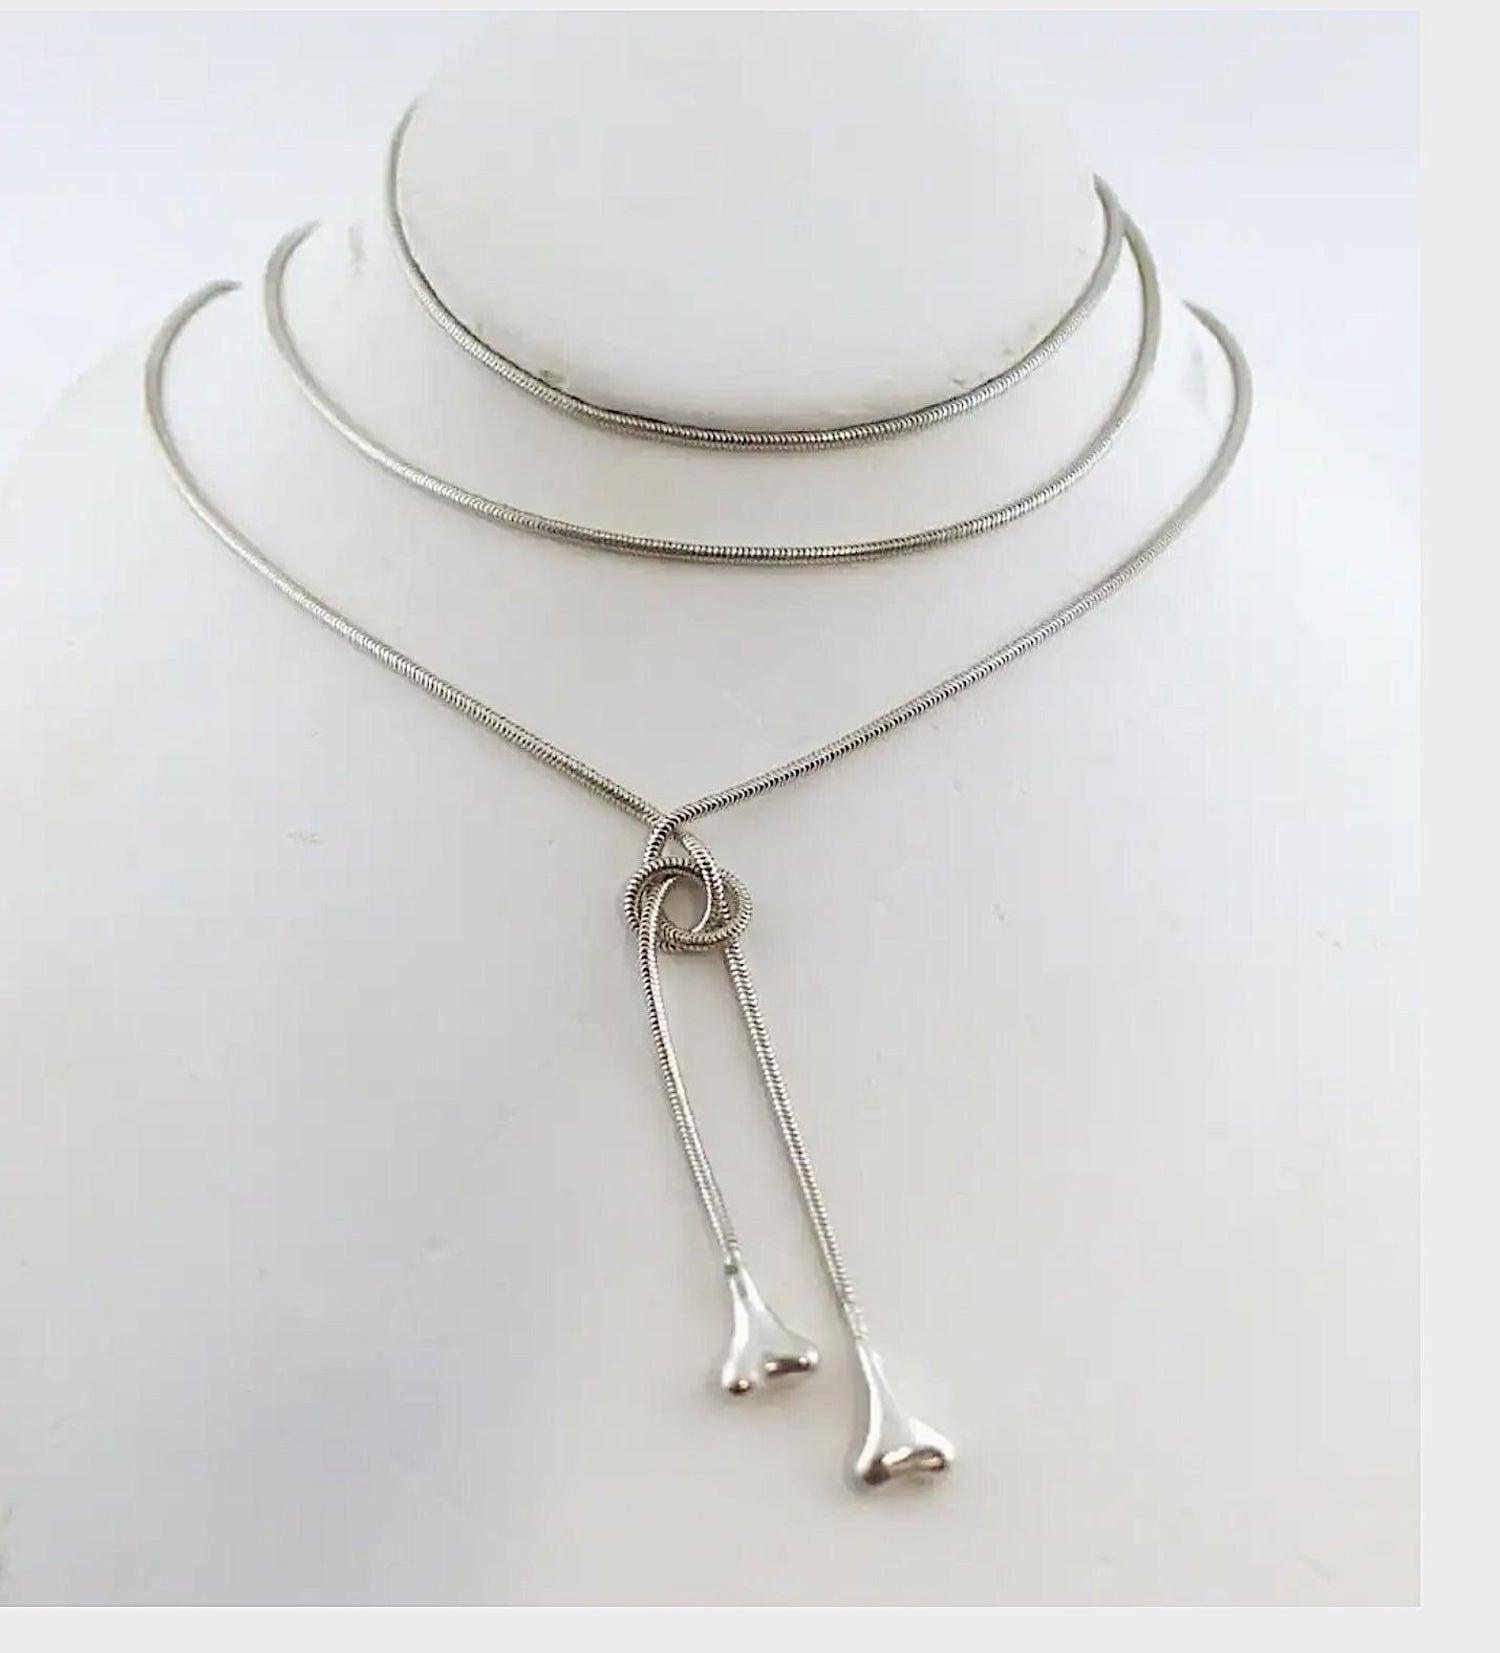 ff1e8fb07 Tiffany Sterling Silver 50